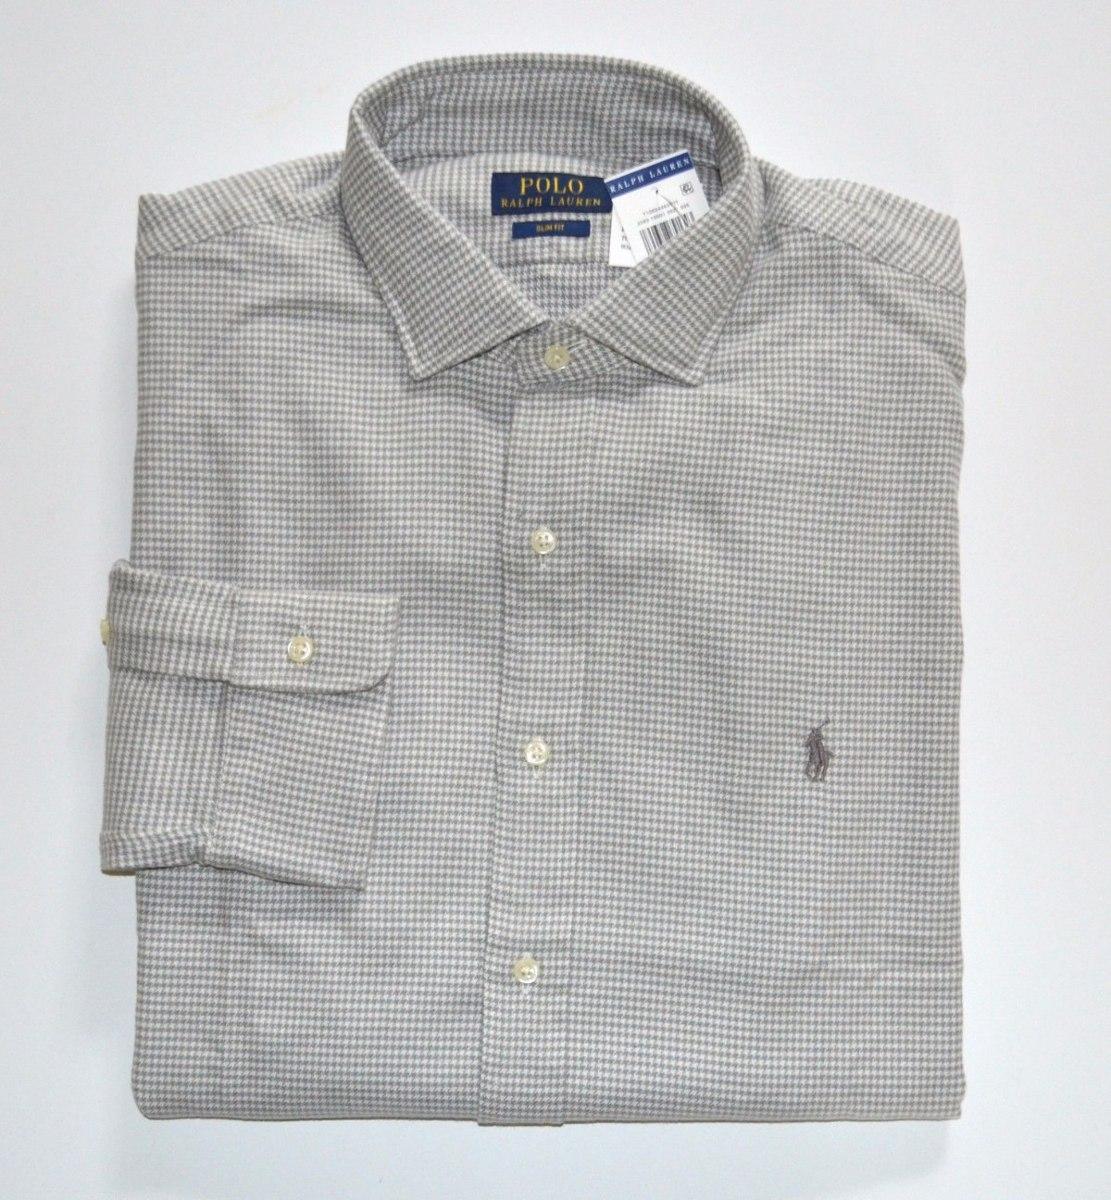 camisa social polo ralph lauren tamanho g l slim fit + justa. Carregando  zoom. 49c99cf7911af